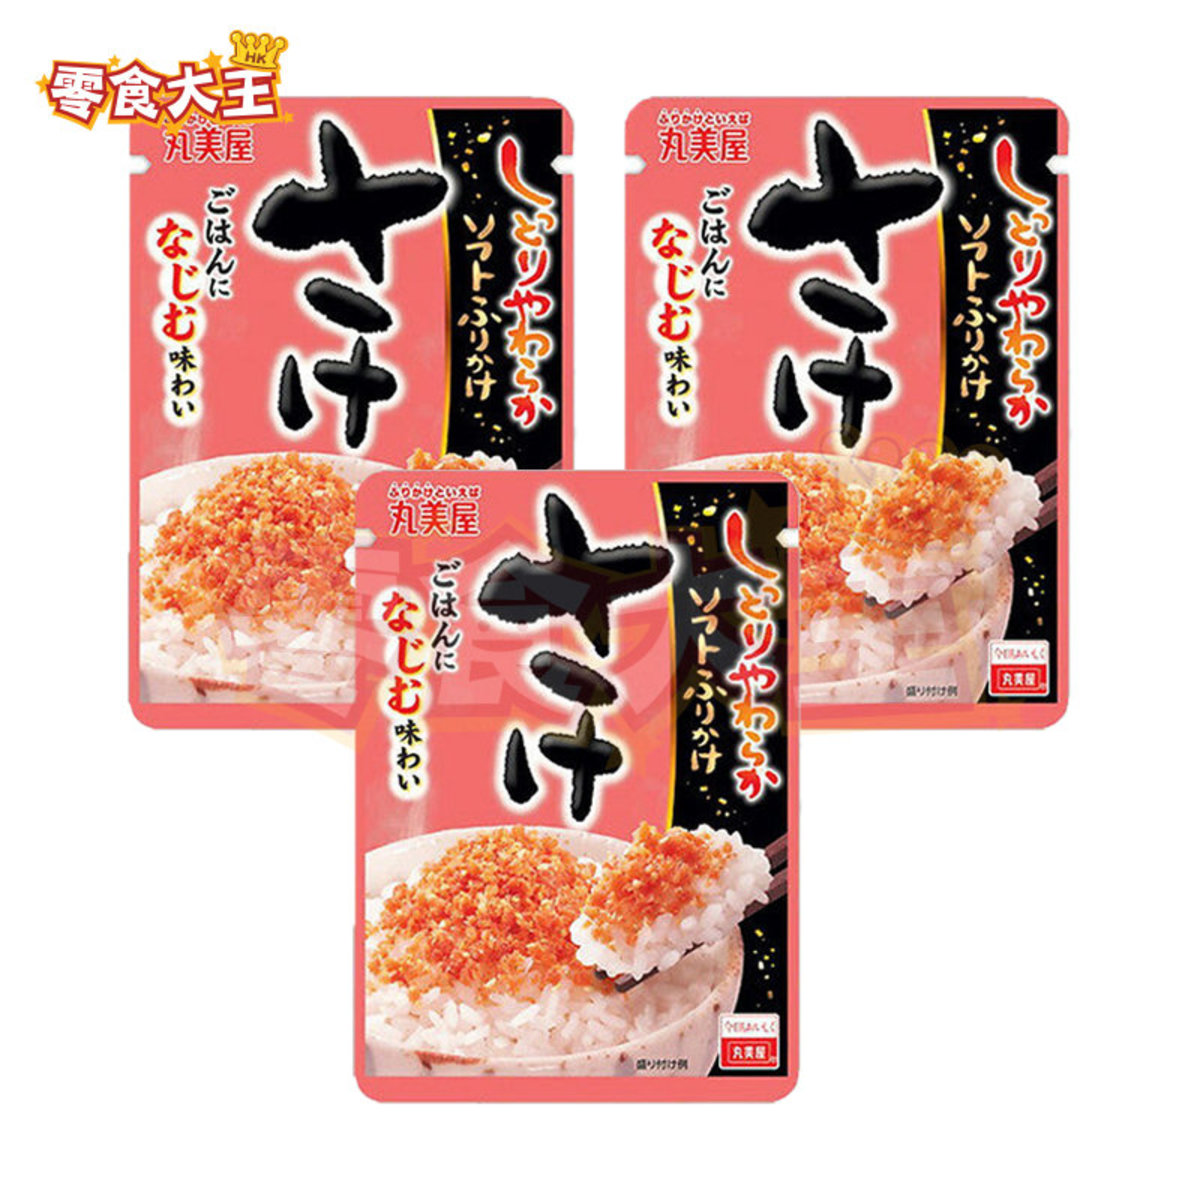 Salmon Furikake 28g x 3 bags (4902820016543_3)